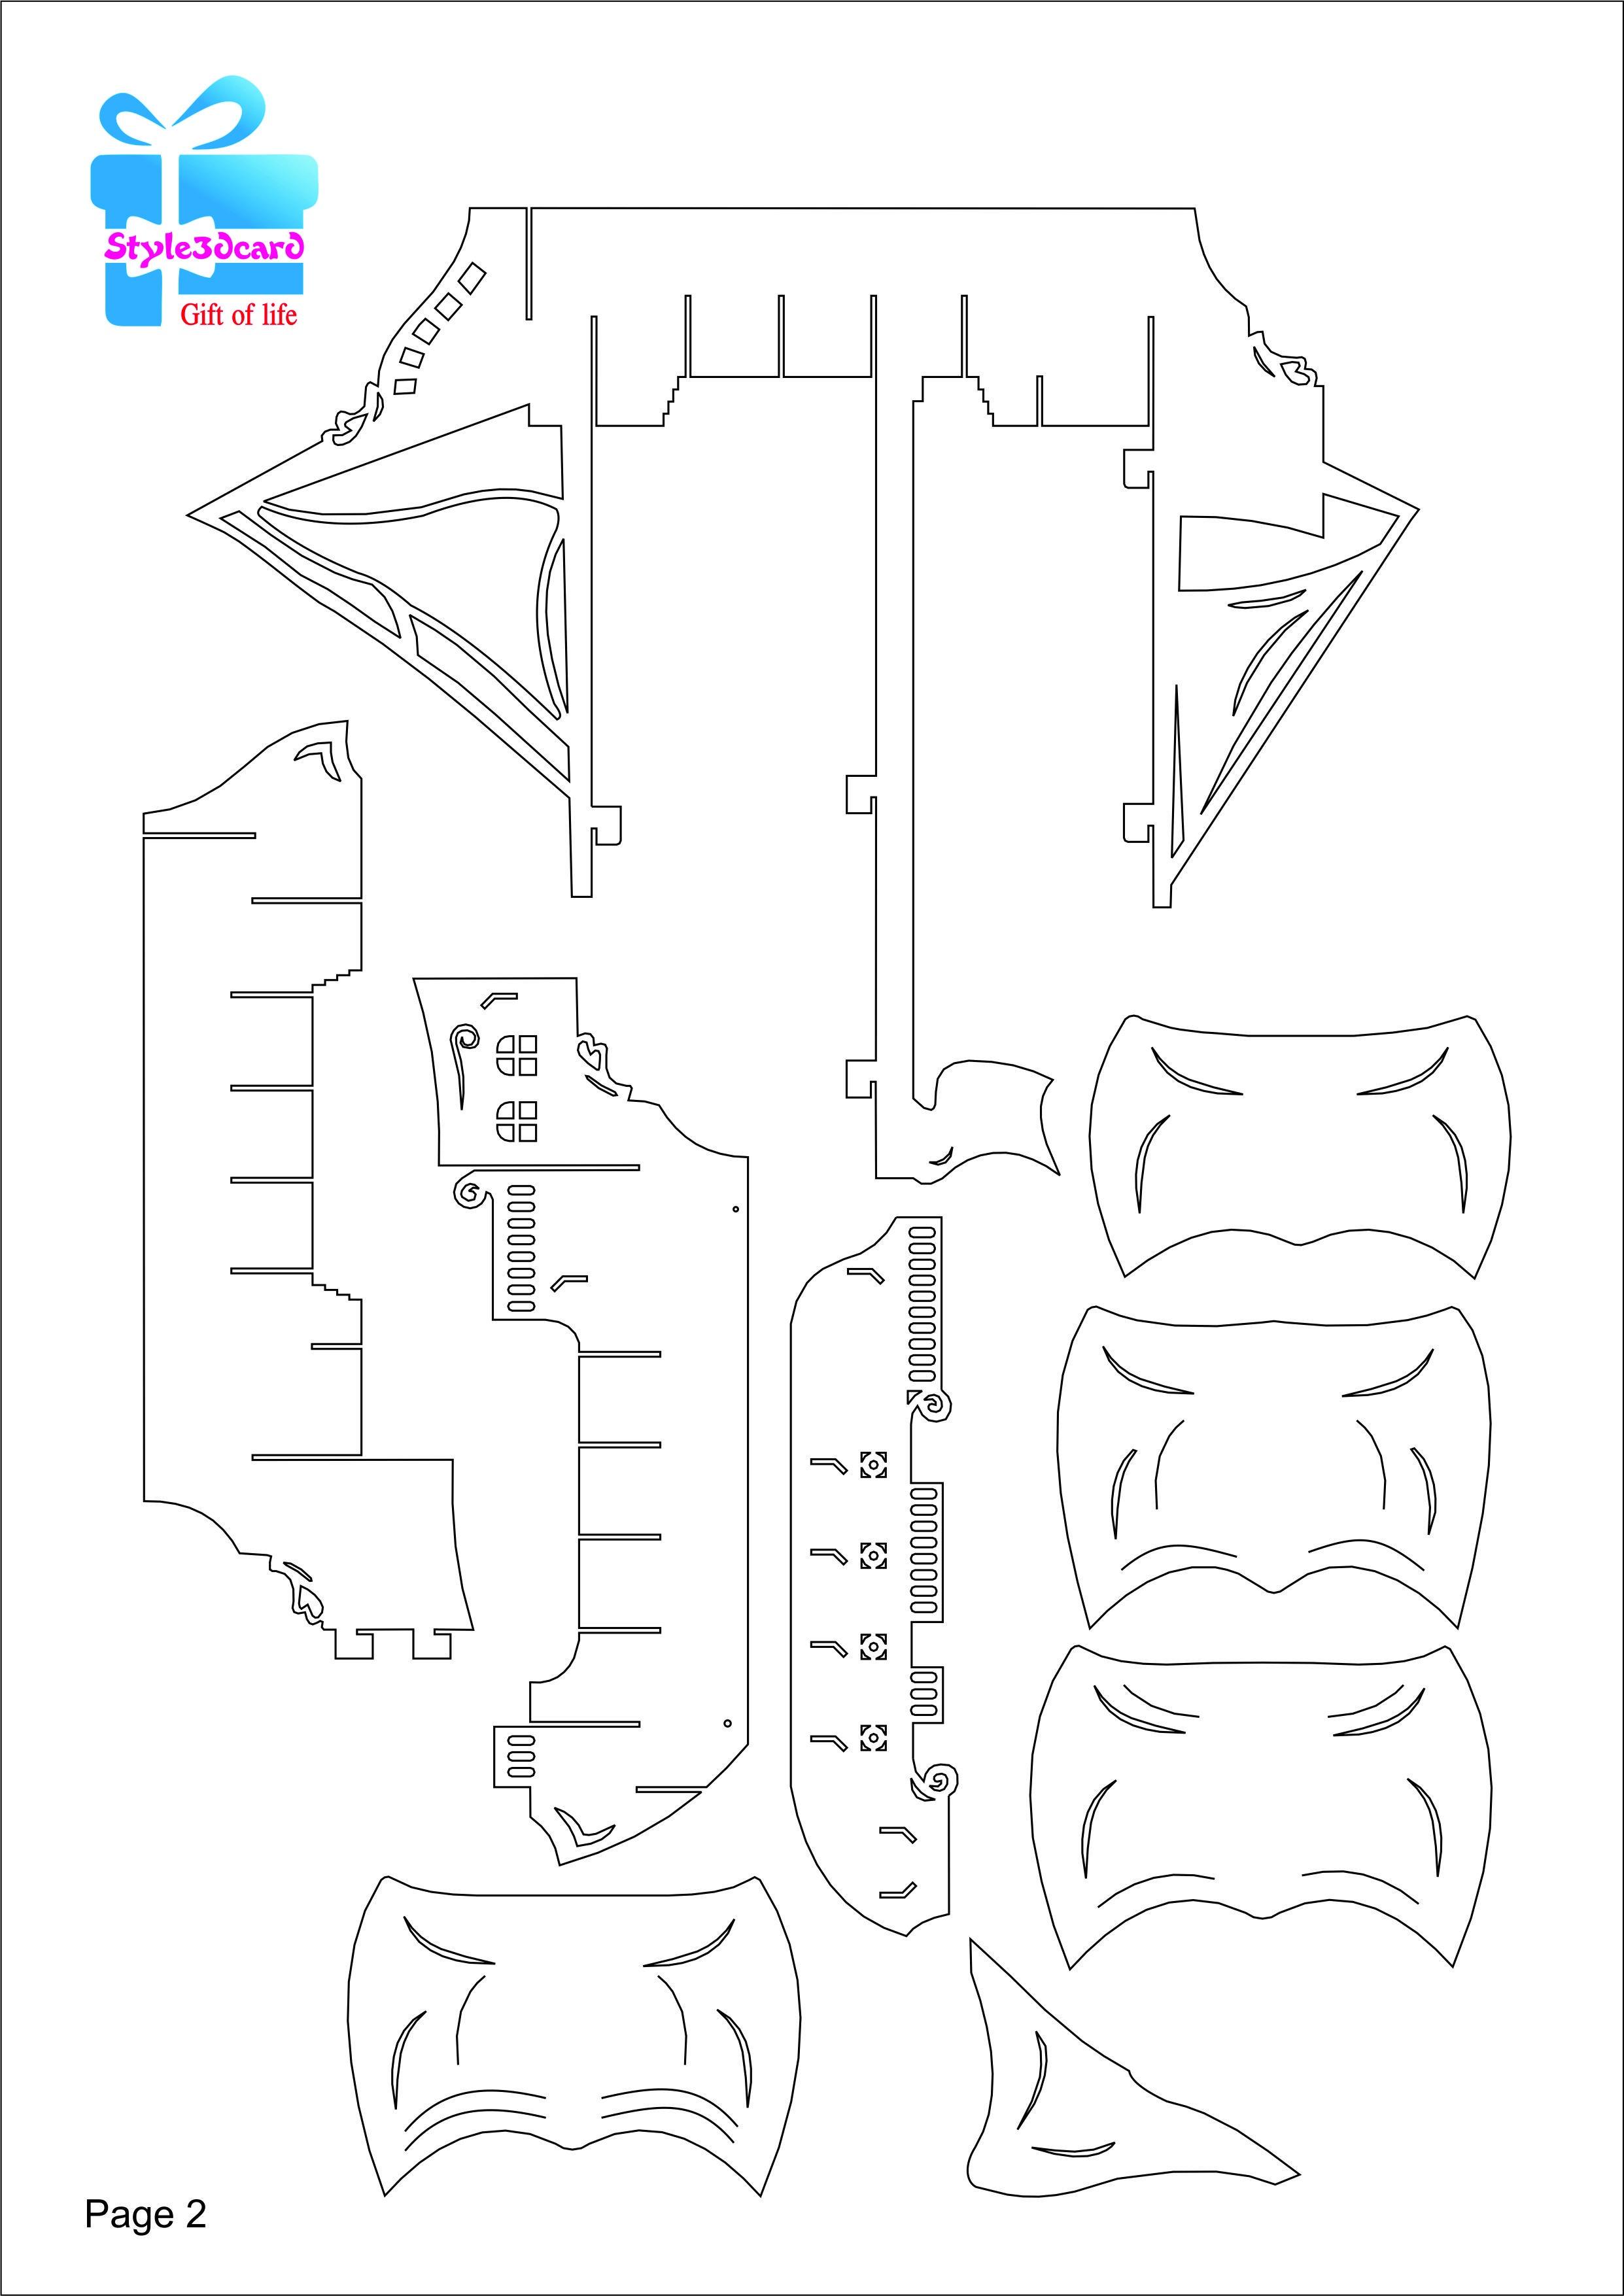 Pirate Ship 3D Pop-Up /kirigami Pattern 3 | Pop-Up I Kirigami - Free Printable Kirigami Pop Up Card Patterns